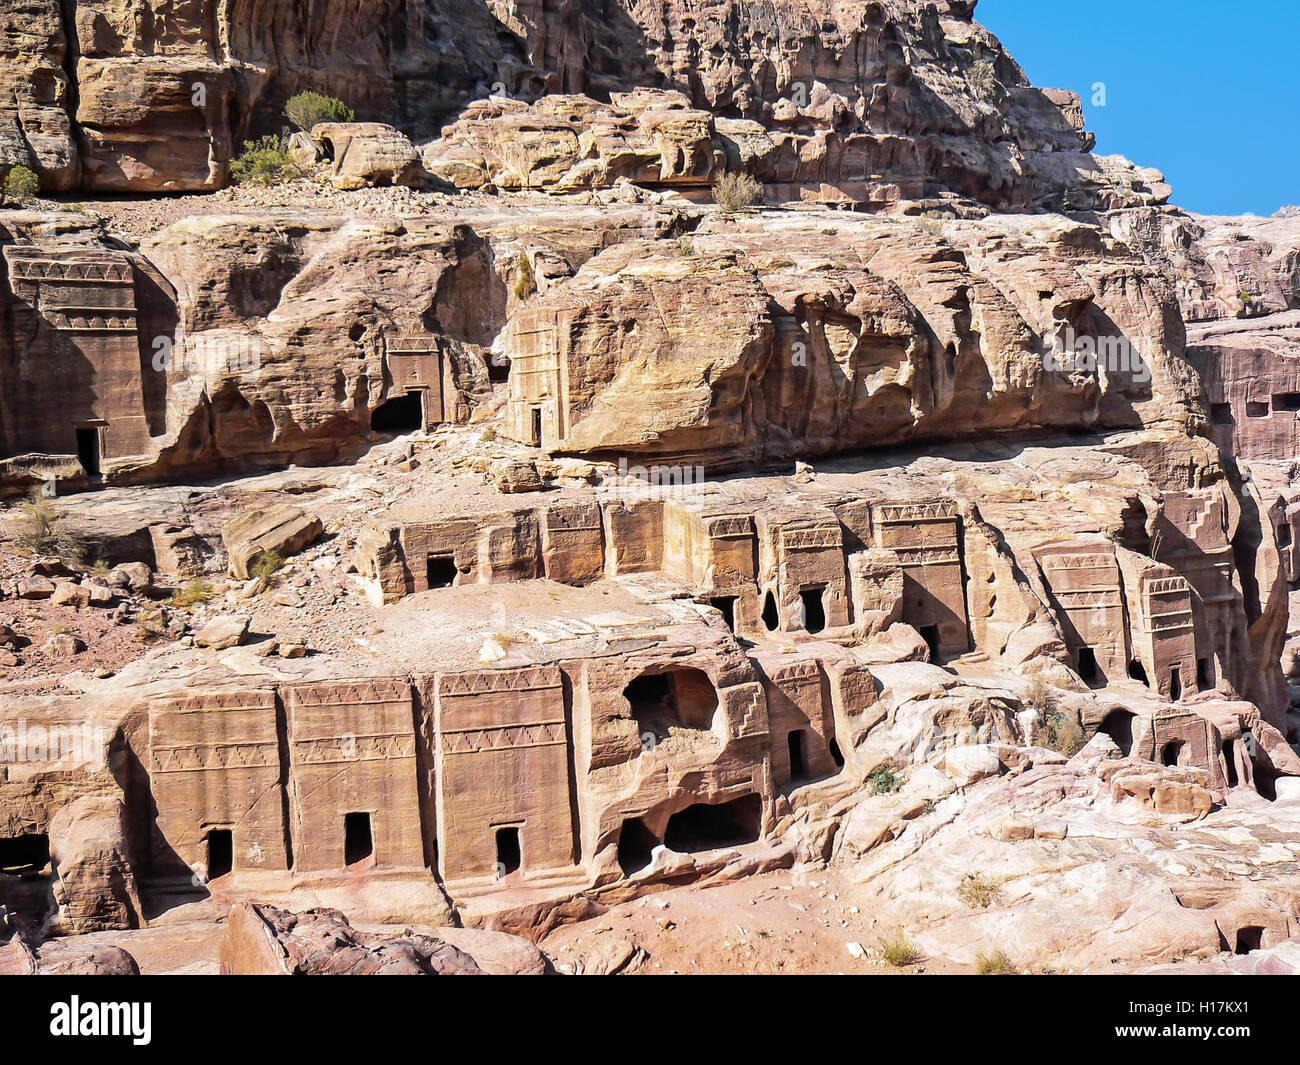 Rue de façades, tombeaux de Petra, Jordanie Photo Stock